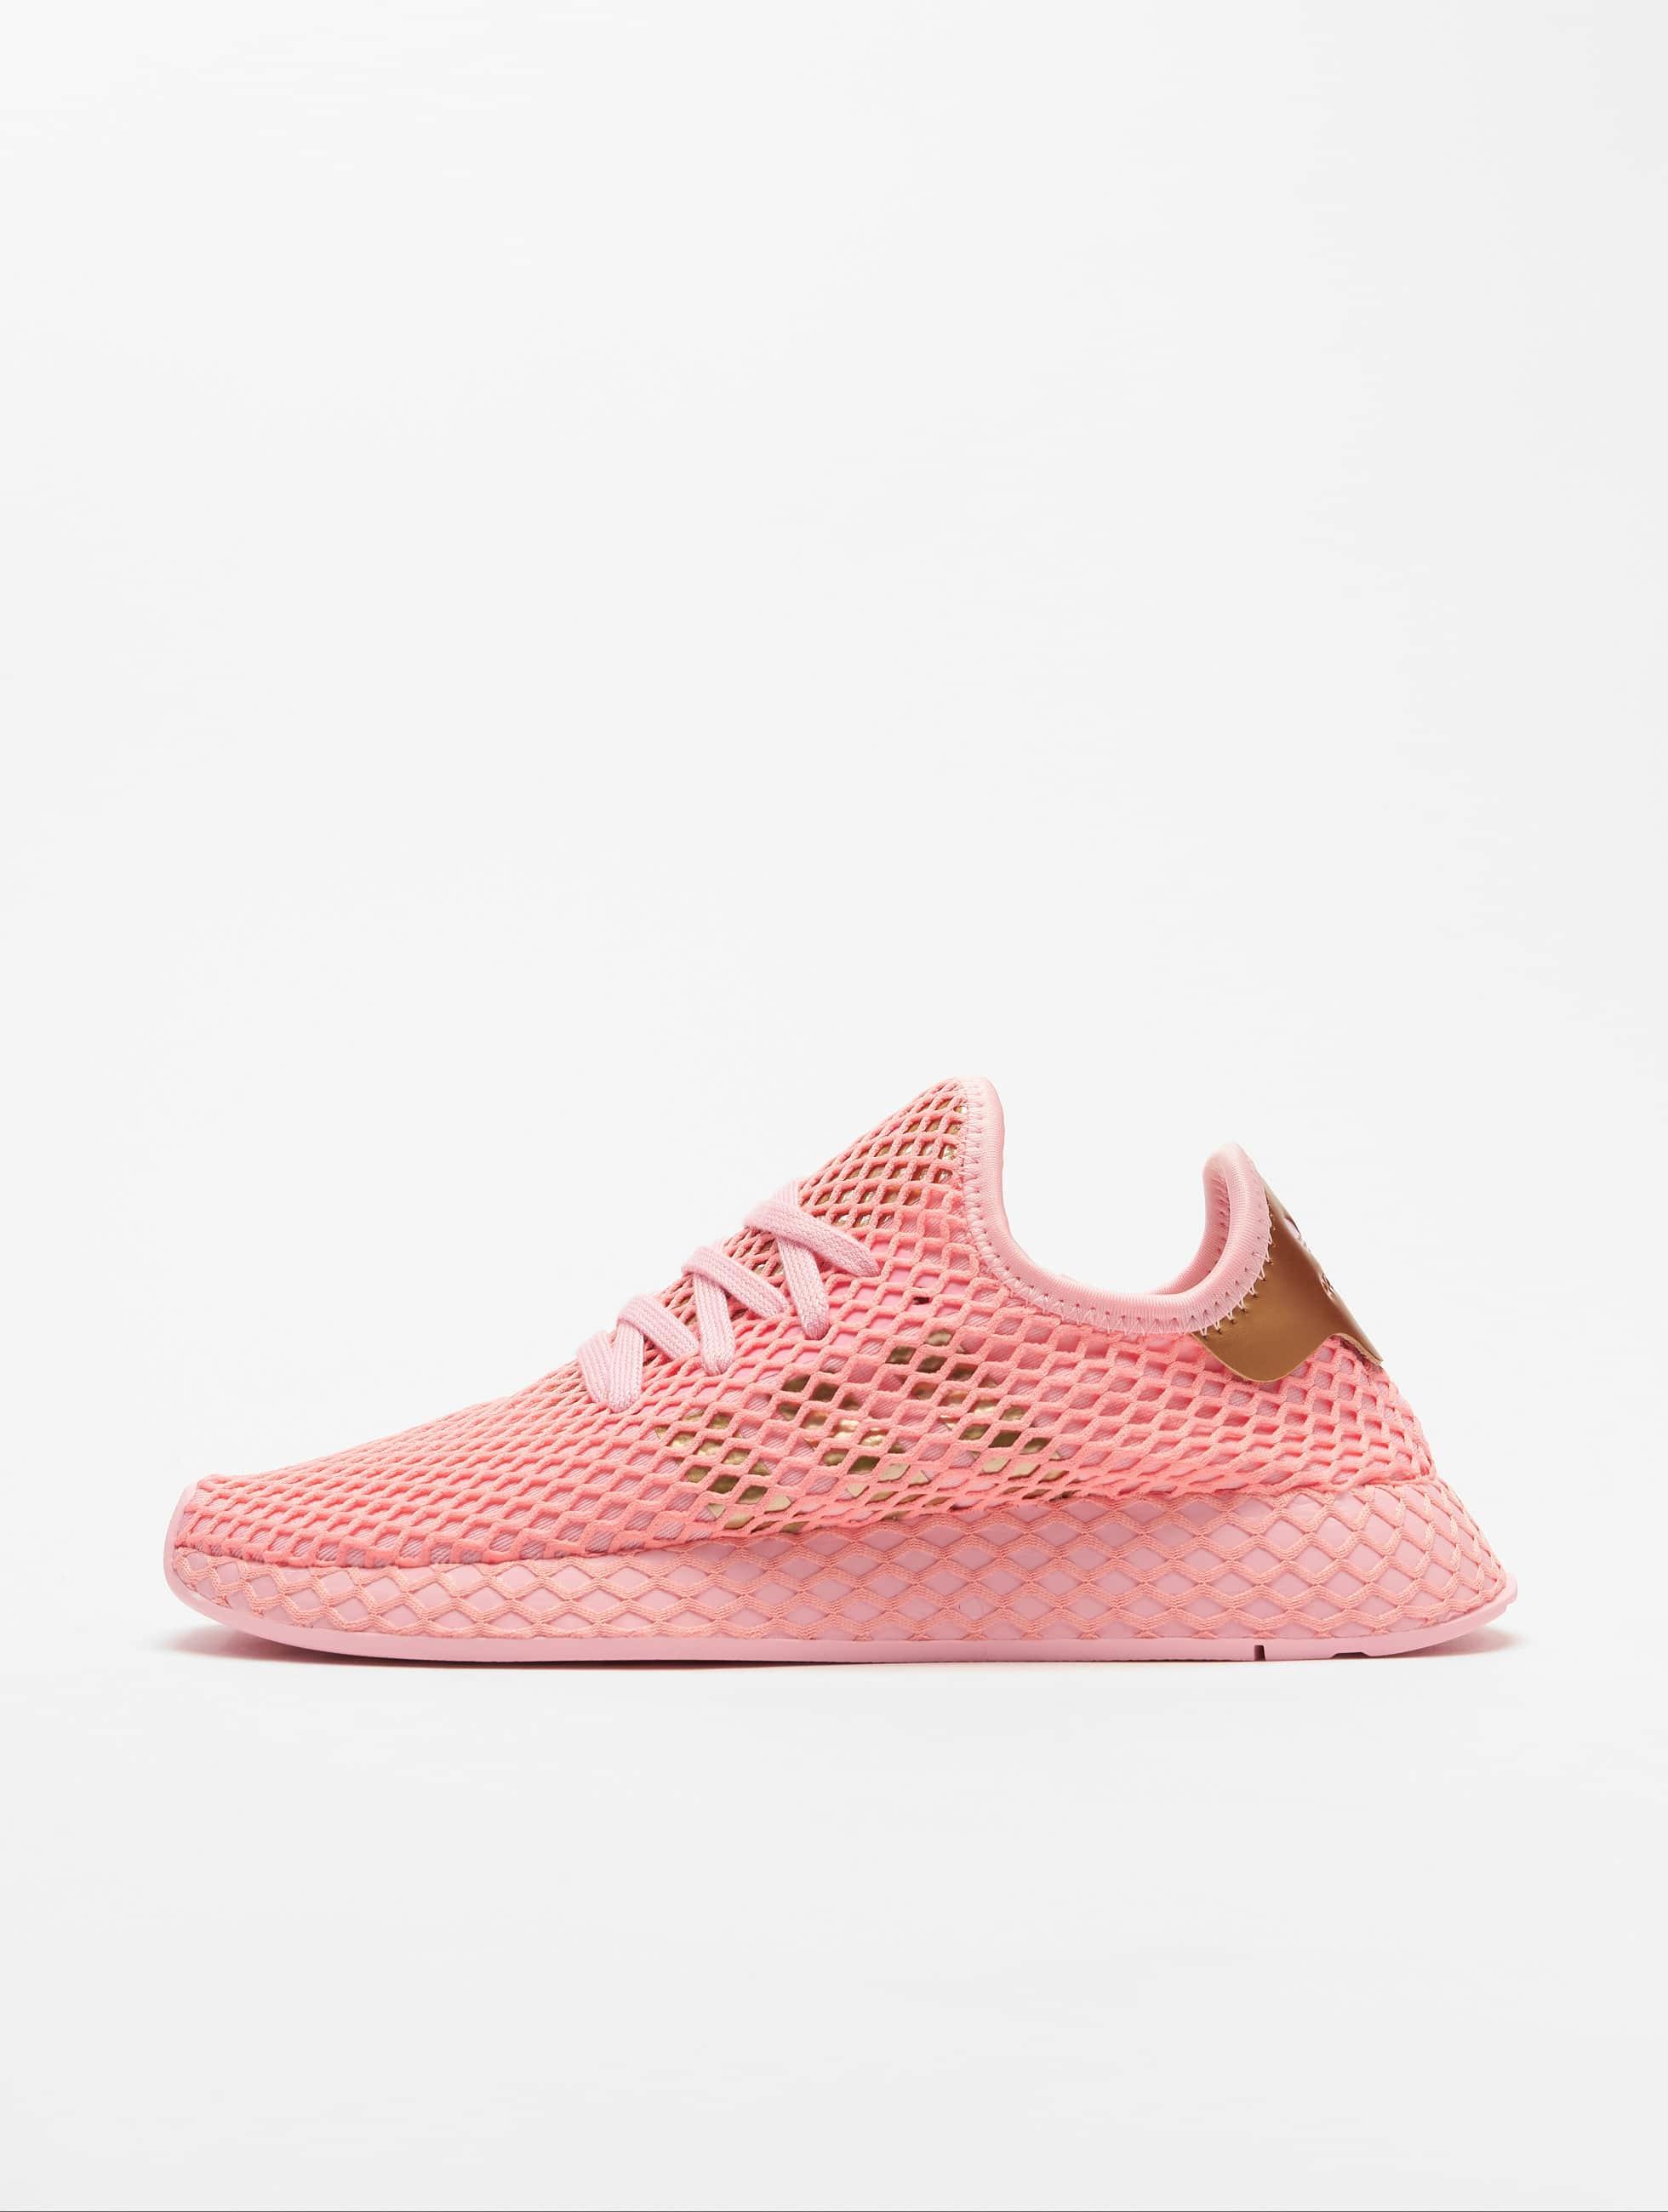 Adidas Deerupt Runner Sneakers True PinkCopper Met.Glory Pink